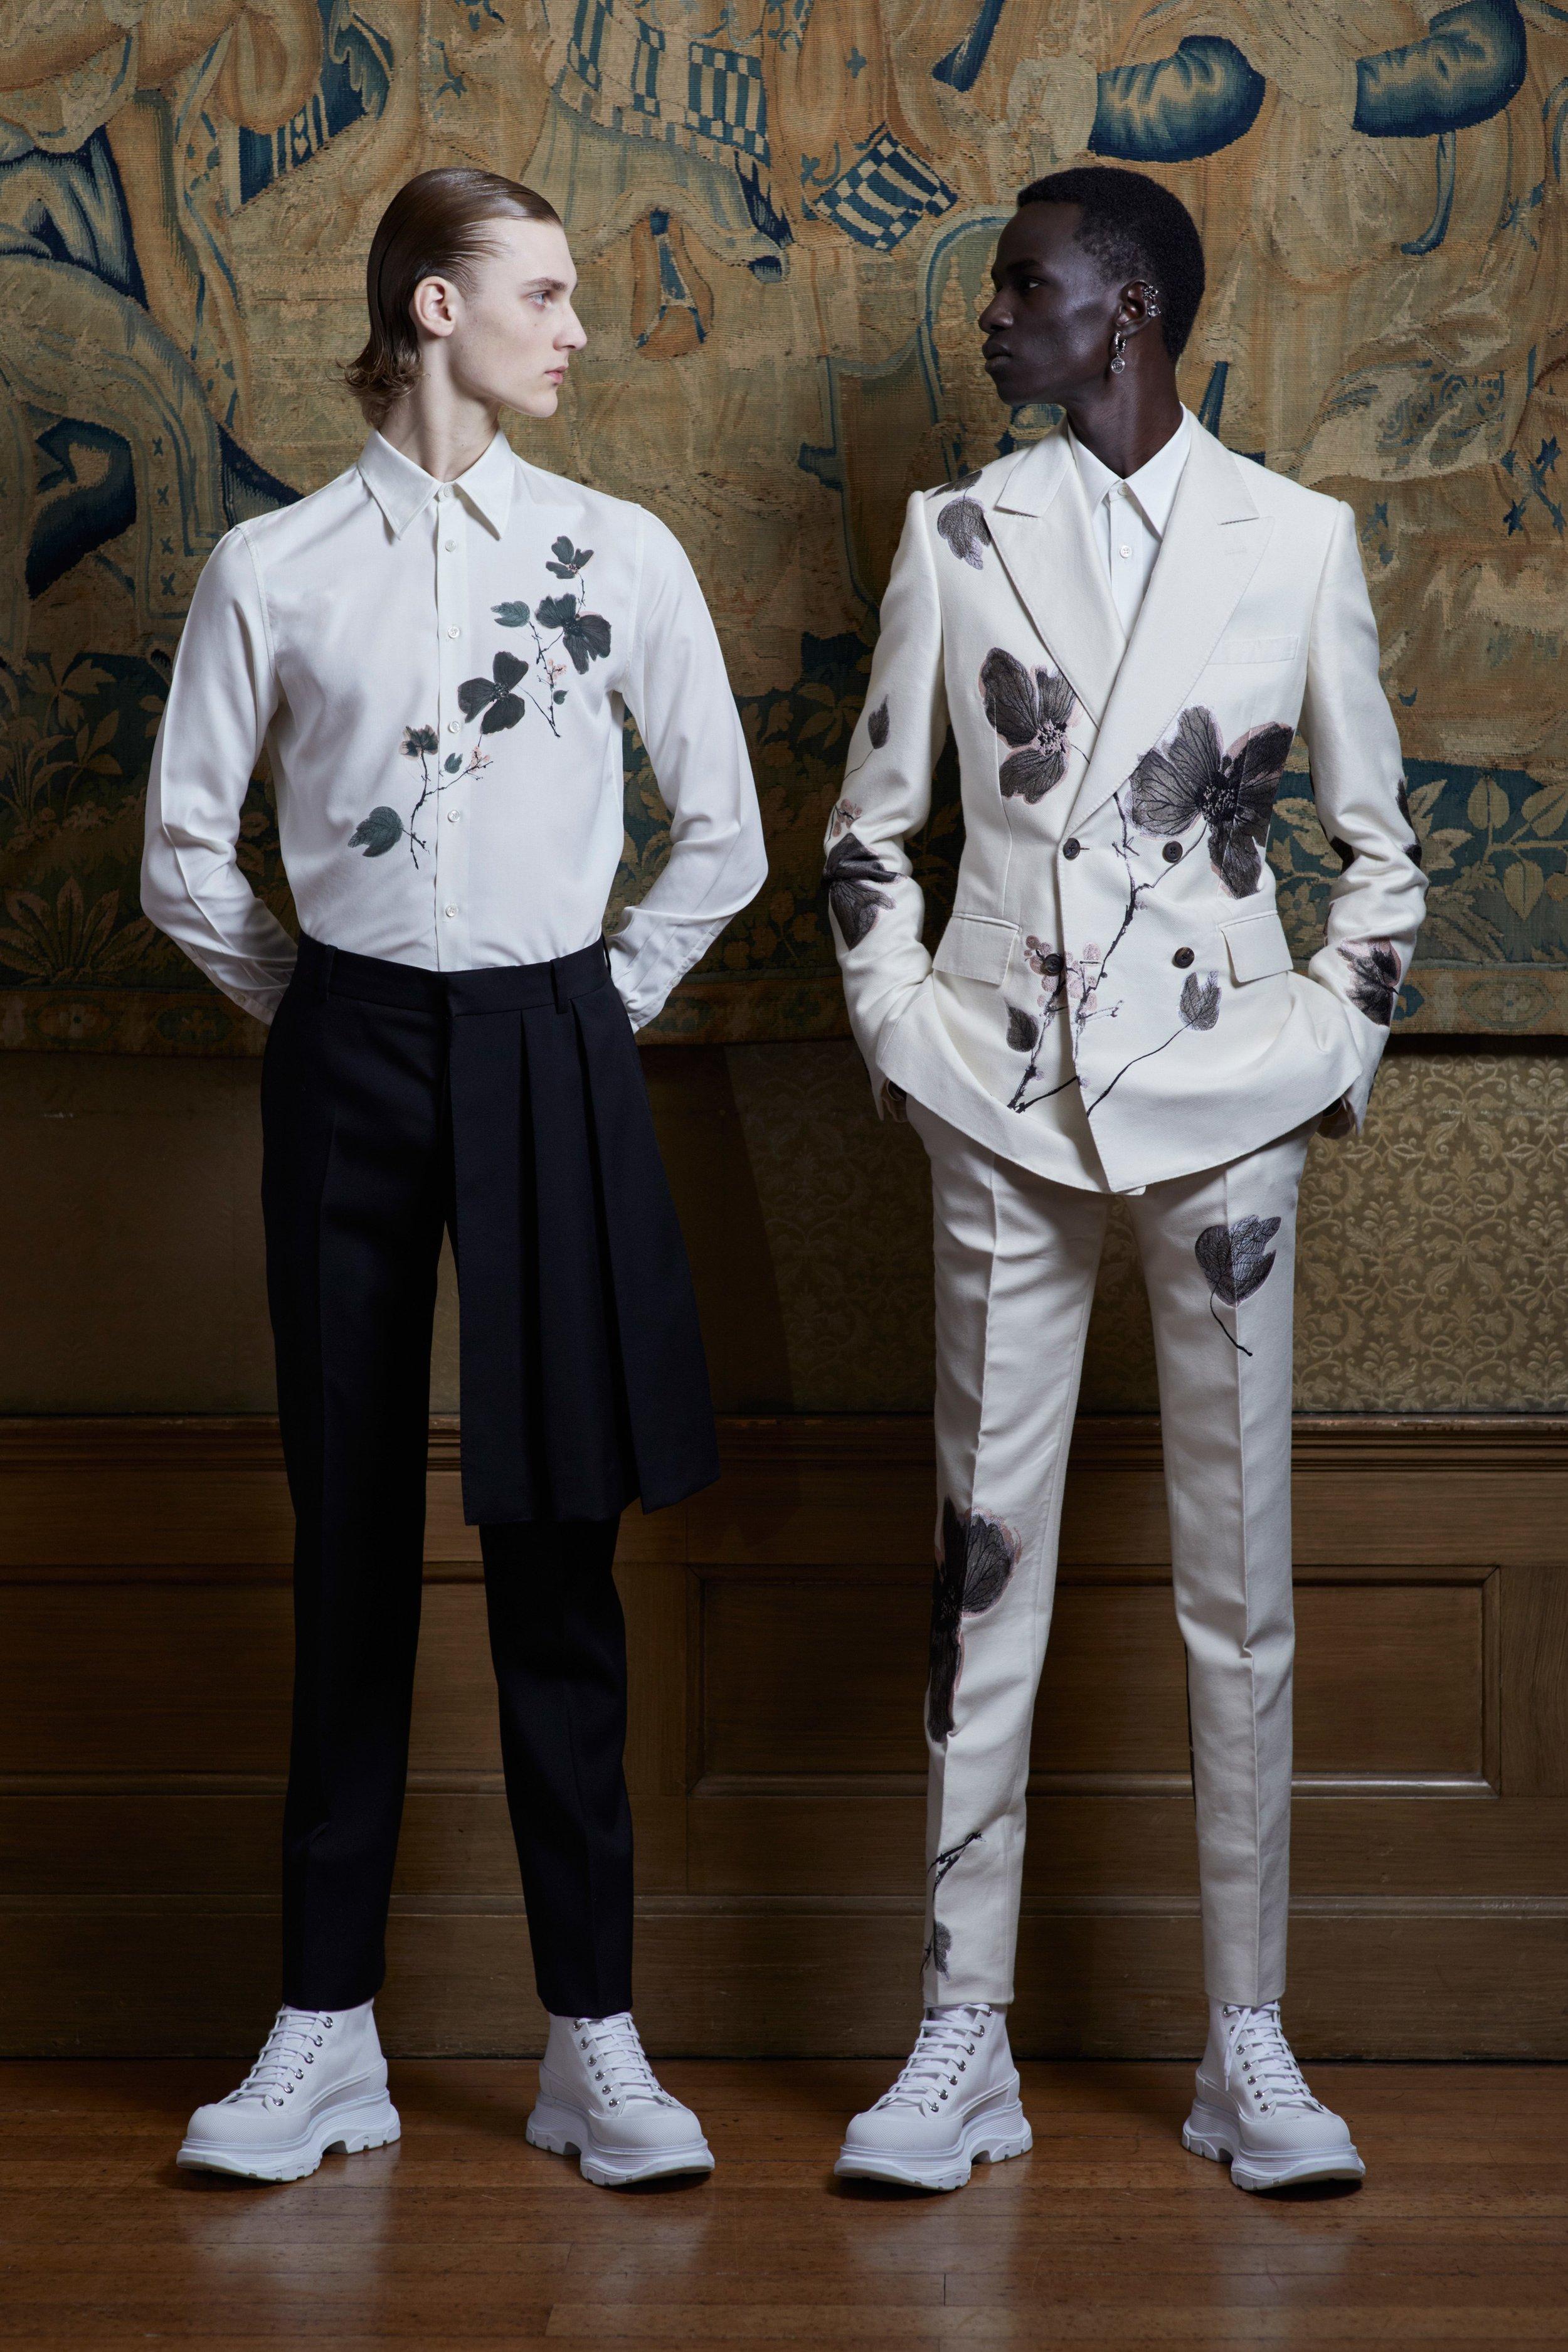 00002-alexander-mcqueen-menswear-spring-20-credit-Ethan-James-Green.jpg